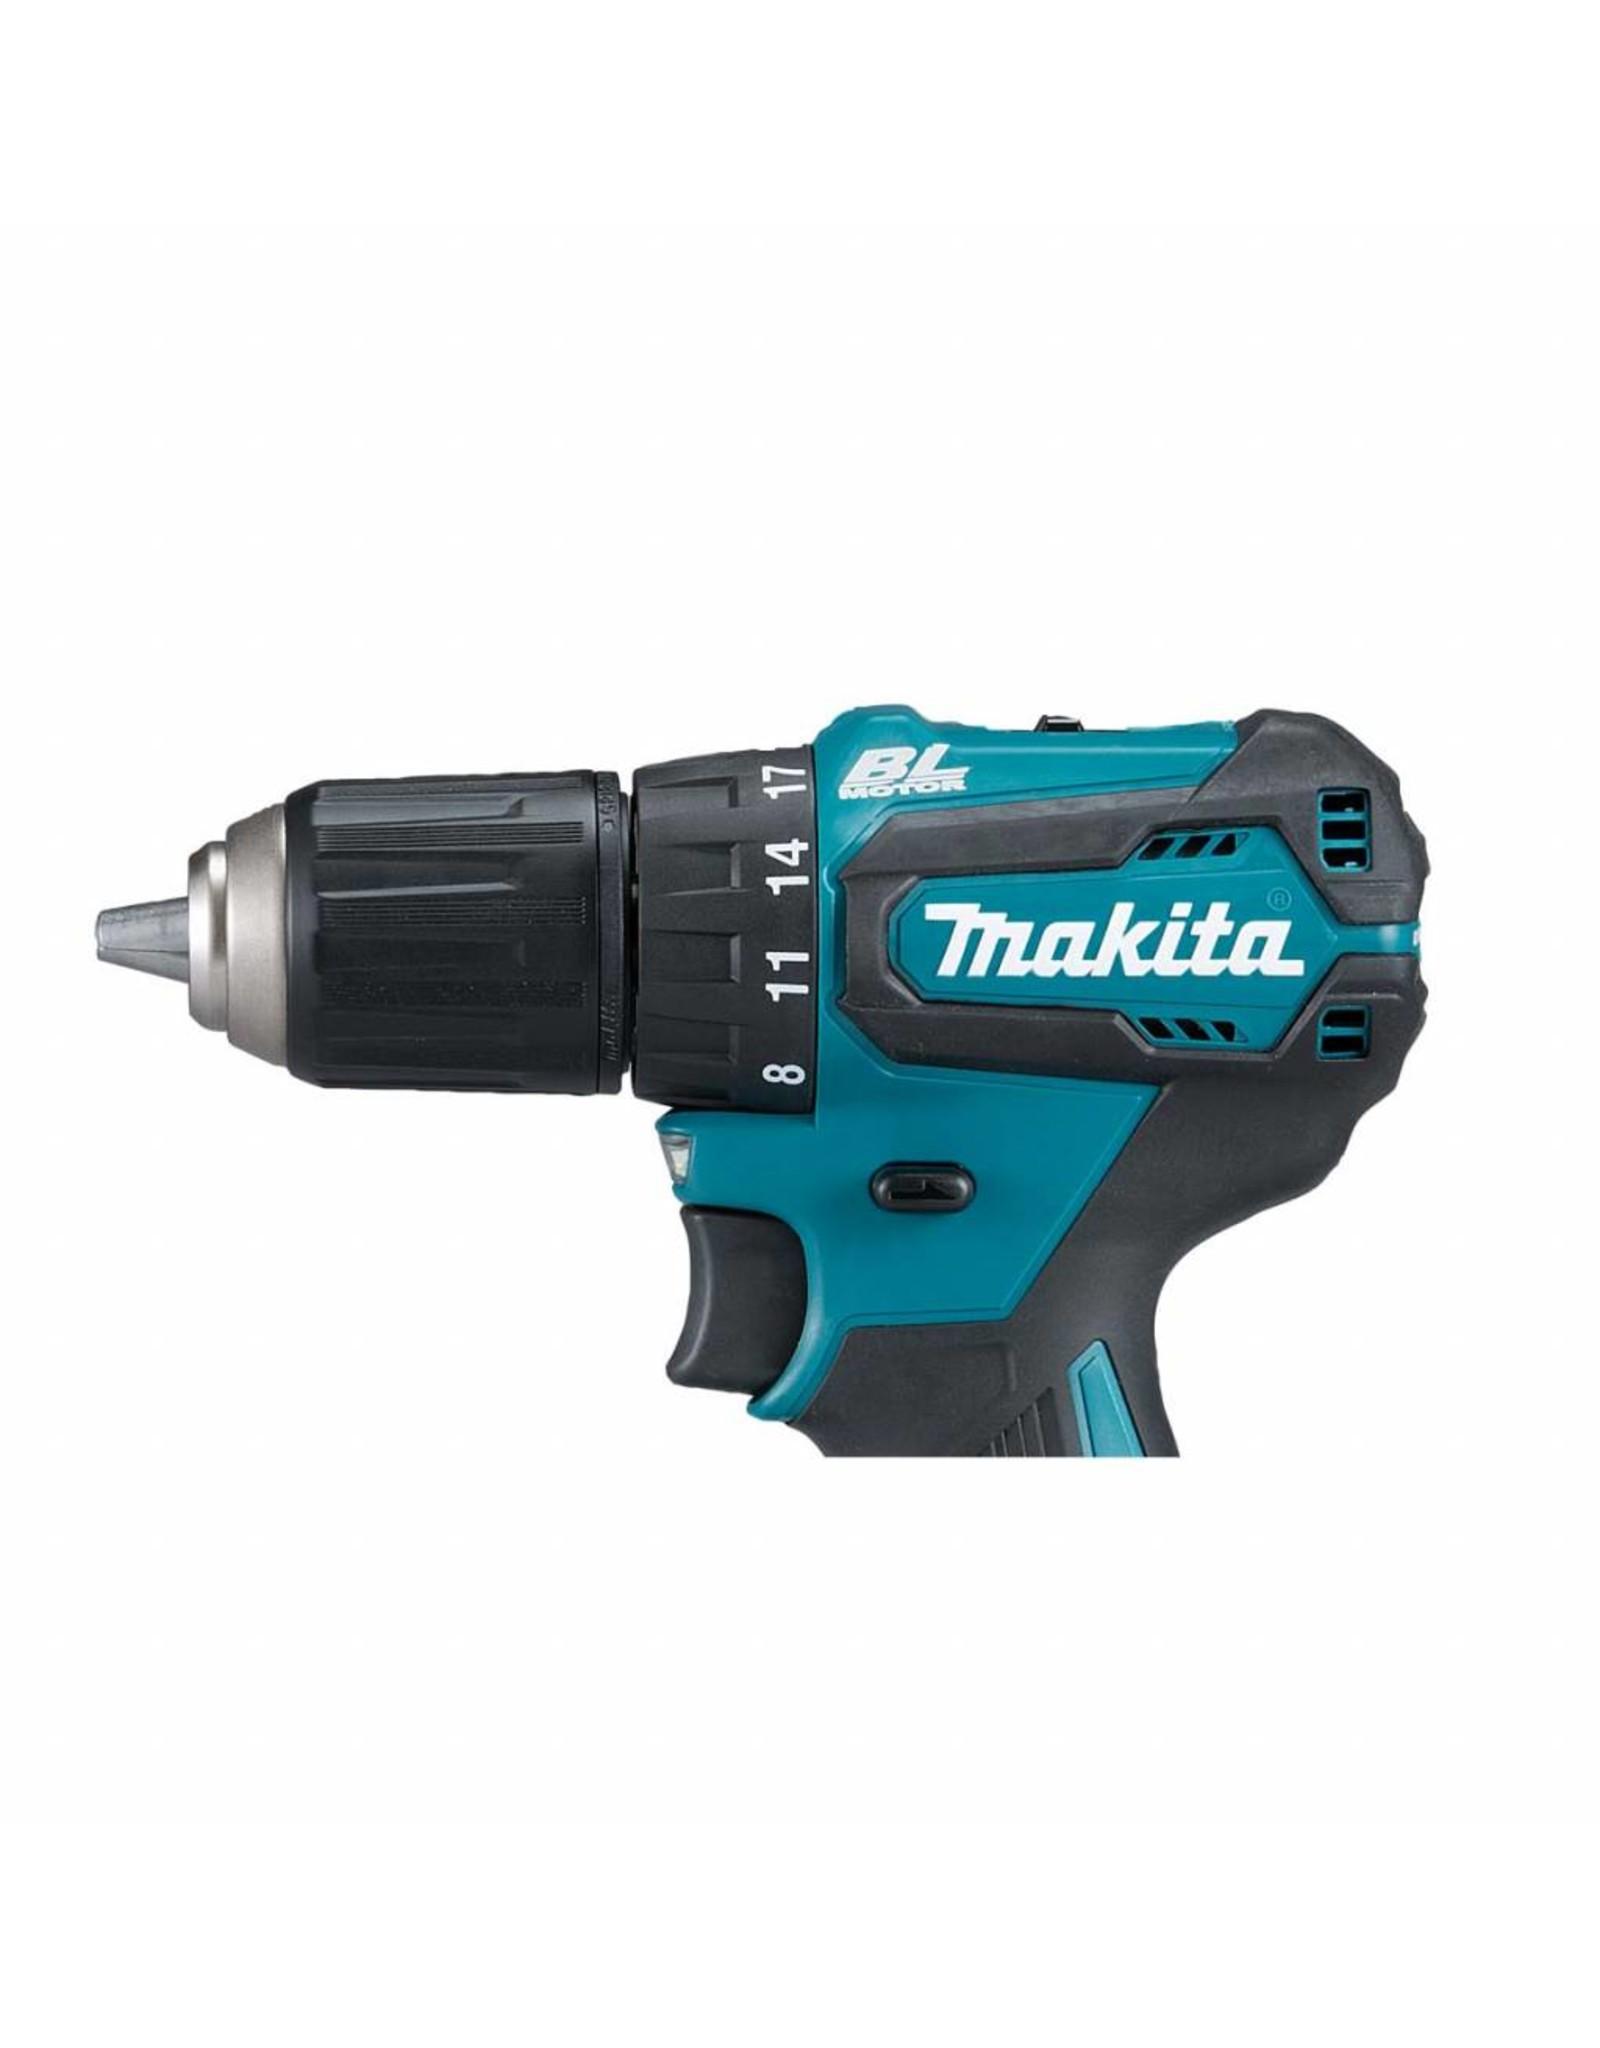 Makita Makita DDF483Z accu boor-schroef machine